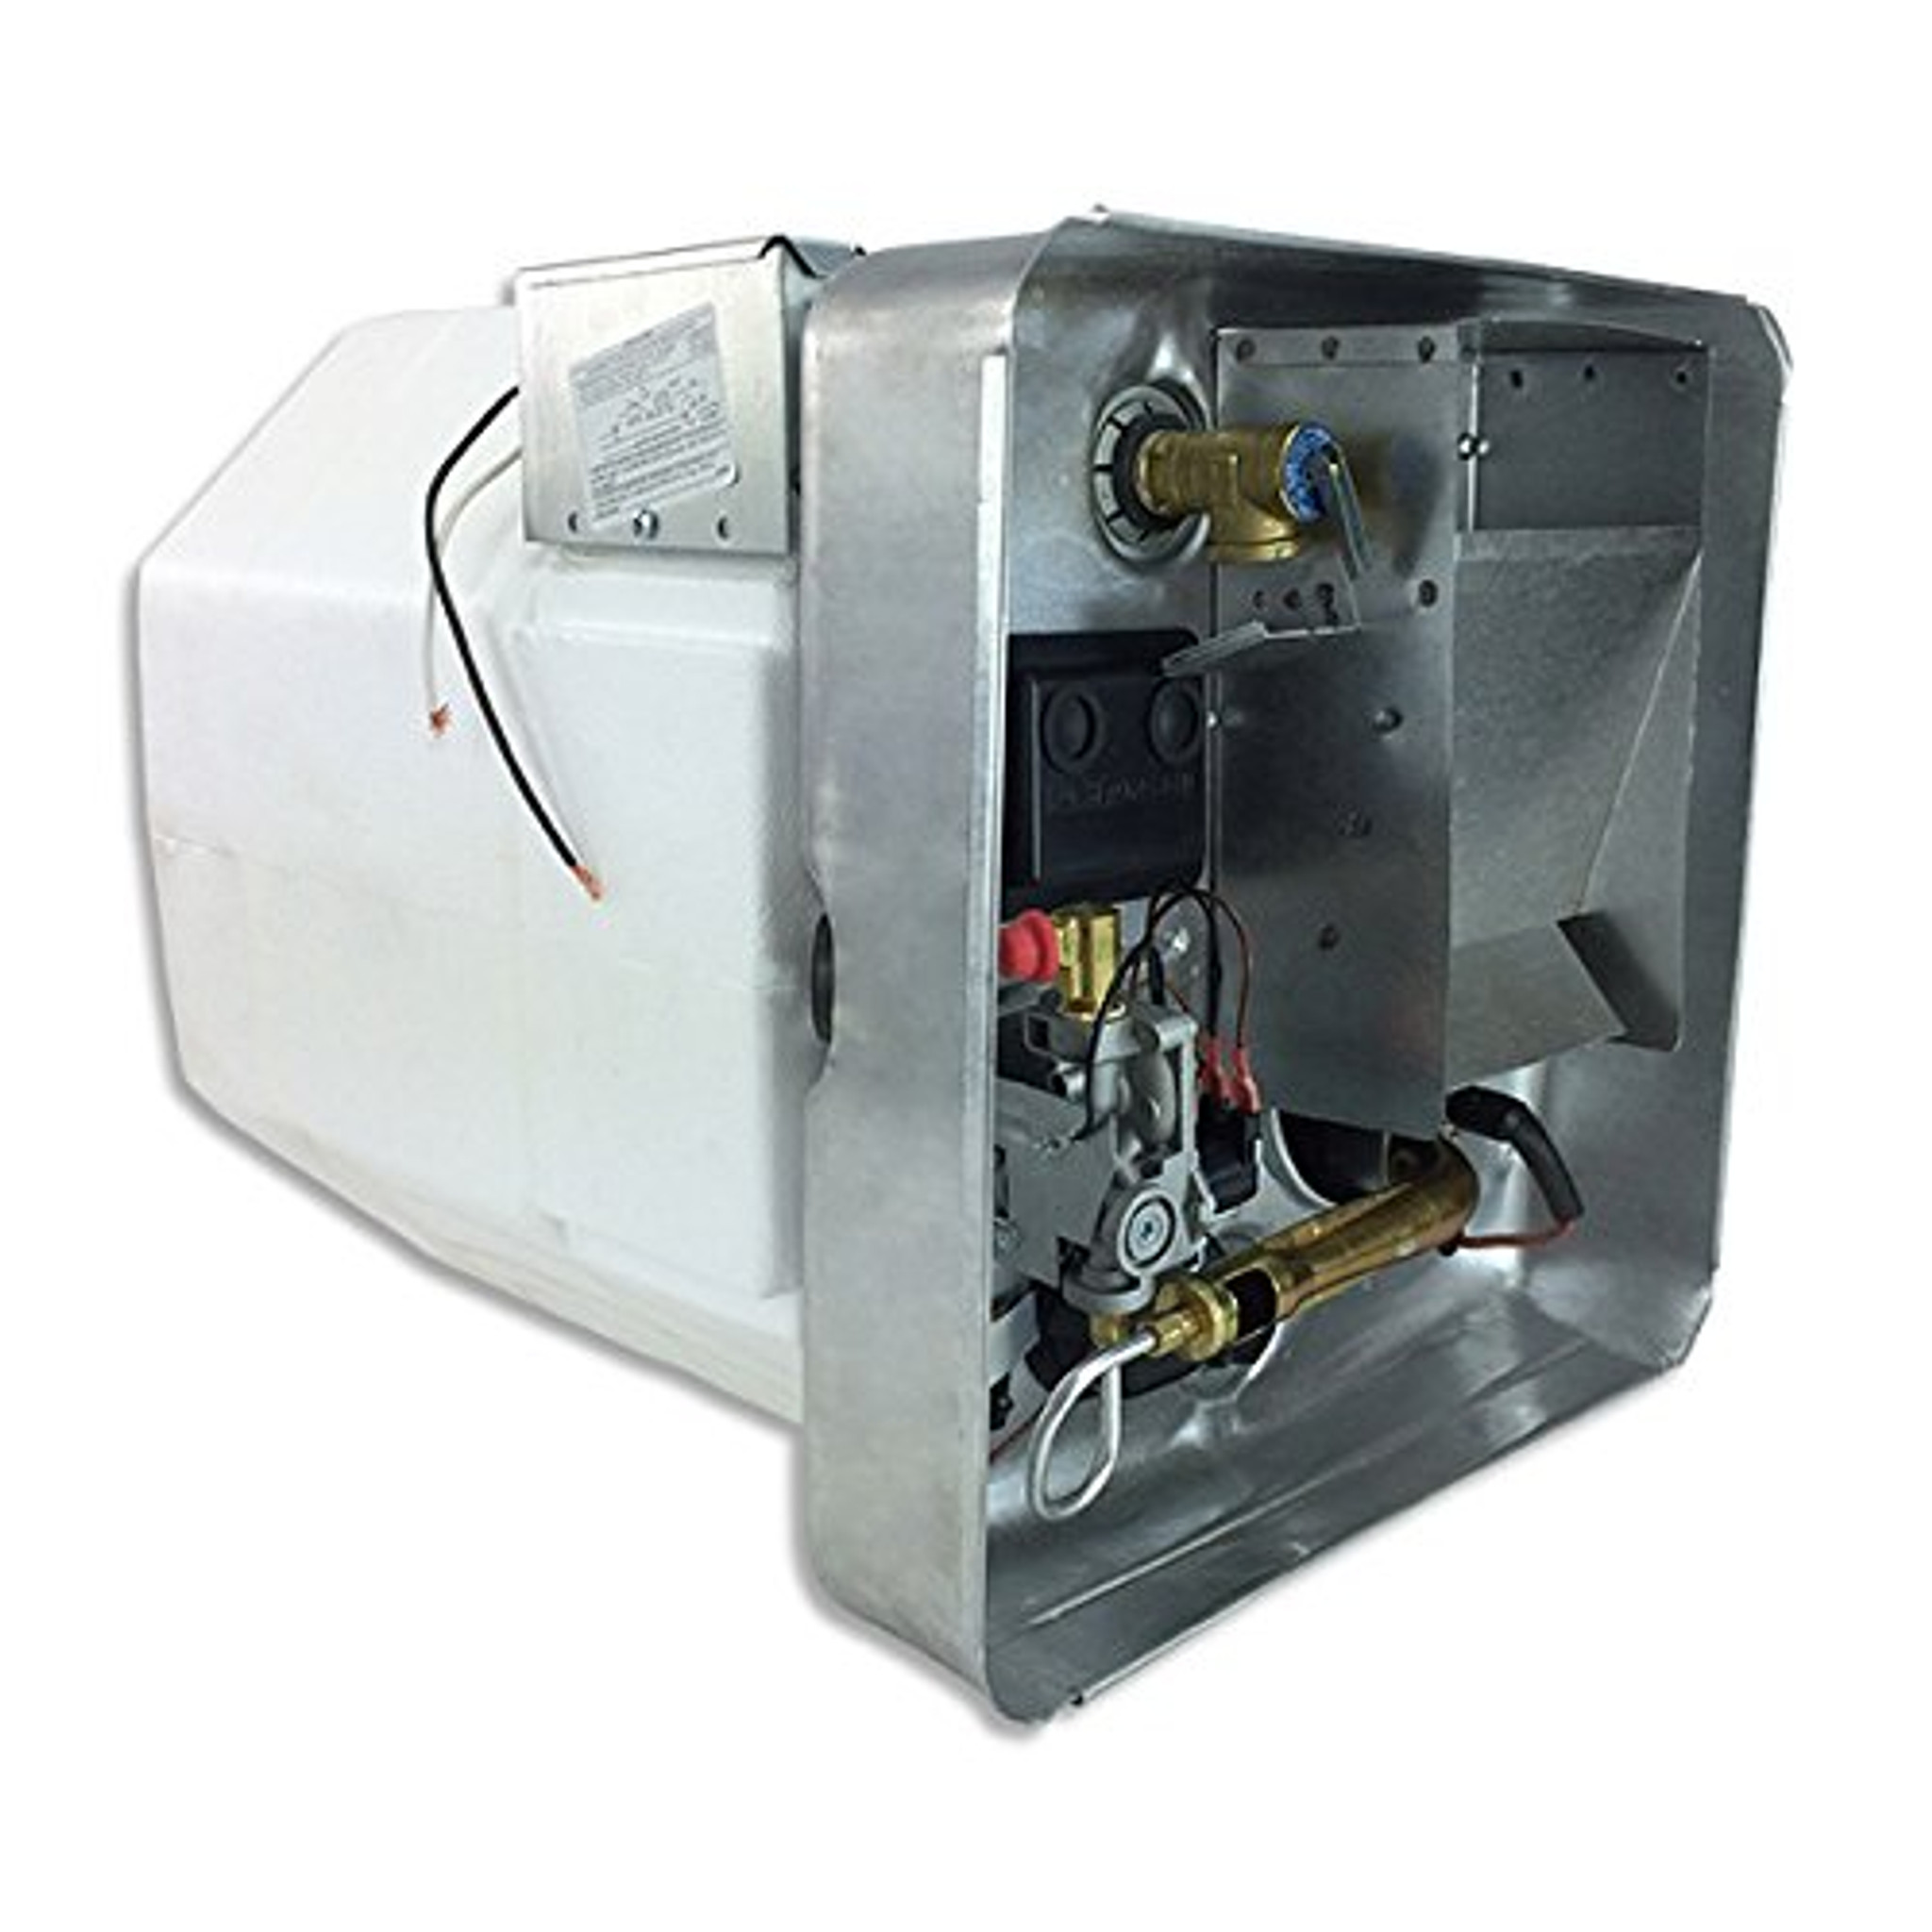 Suburban Sw10pe Manual Pilot Gas With Electric 10 Gallon Water Heater